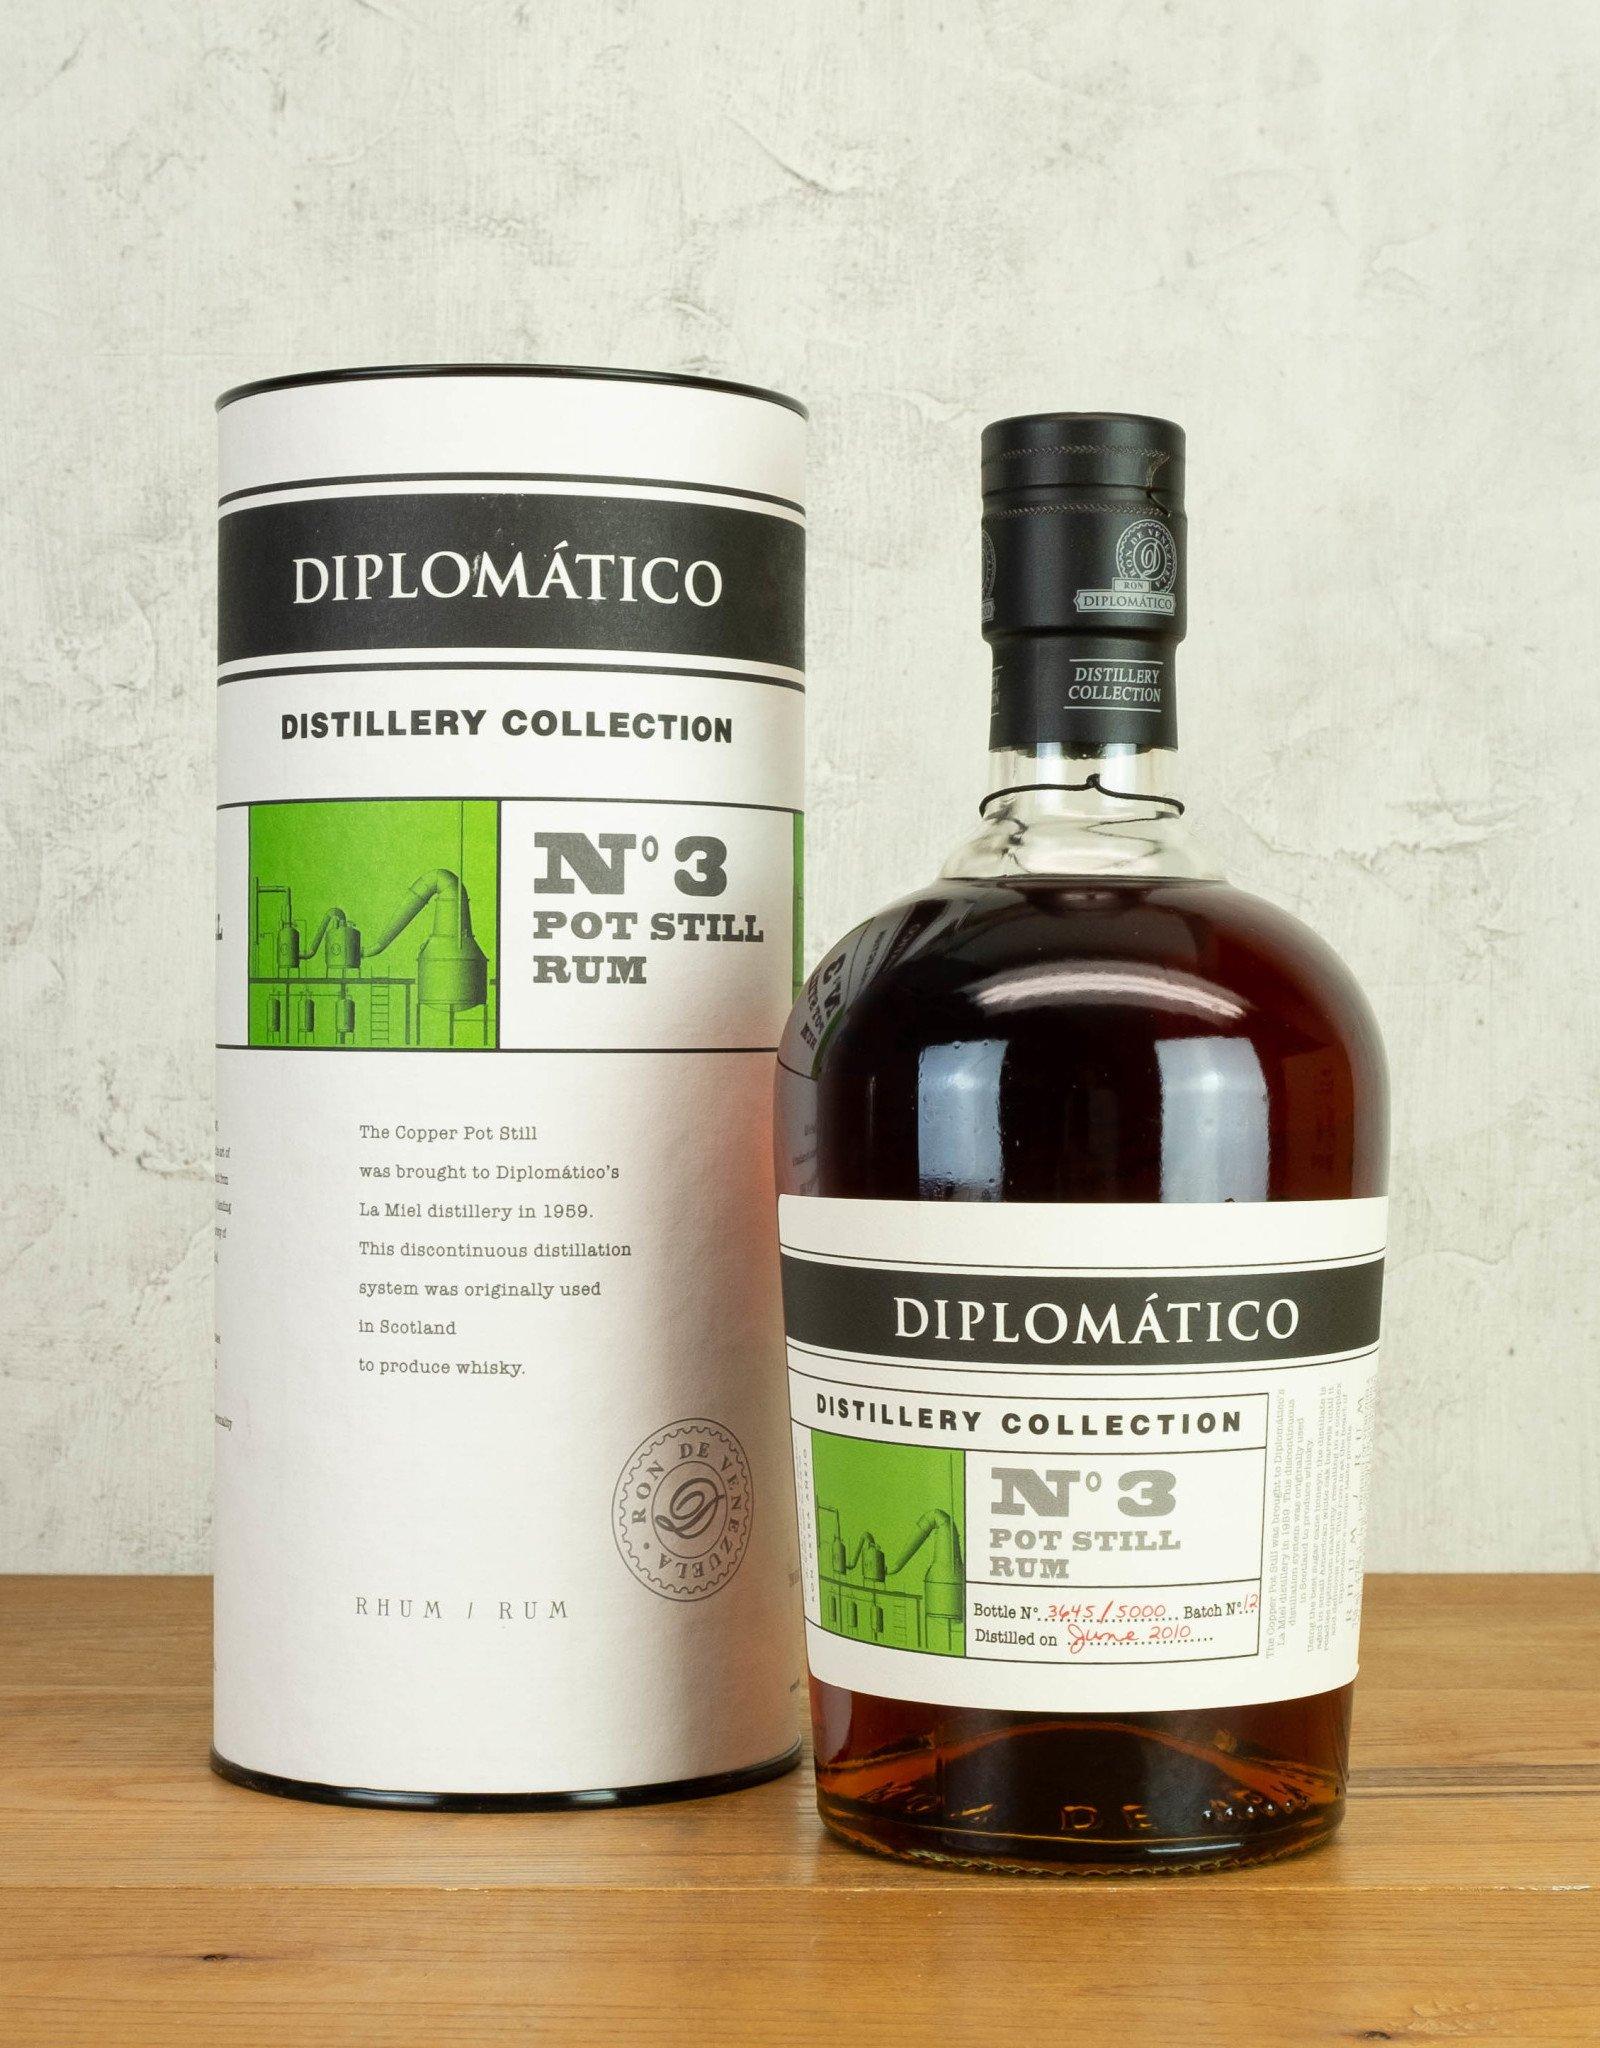 Diplomatico Distillery Collection No 3 Pot Still Rum